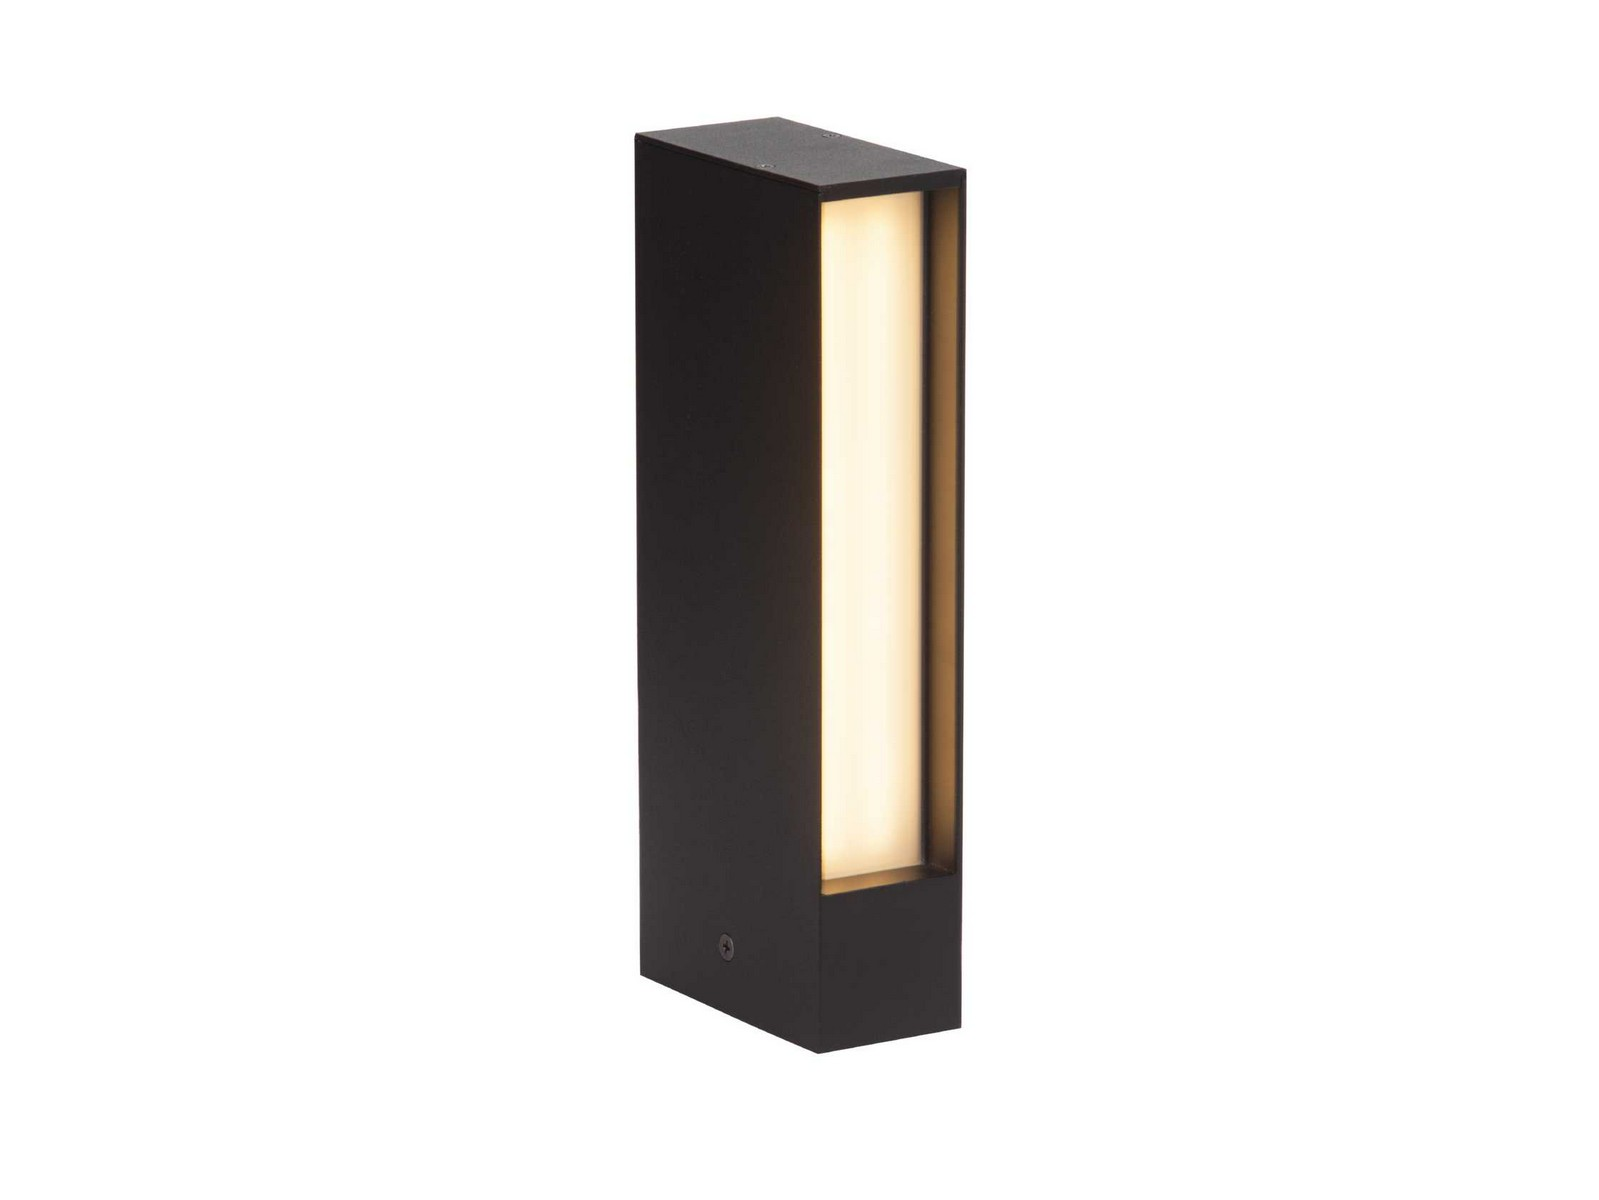 Лампа напольная HollowУличные наземные светильники<br>Вид цоколя: LED&amp;amp;nbsp;&amp;lt;div&amp;gt;Количество ламп: 2&amp;amp;nbsp;&amp;lt;/div&amp;gt;&amp;lt;div&amp;gt;Наличие ламп: светодиодные (LED)&amp;amp;nbsp;&amp;lt;/div&amp;gt;&amp;lt;div&amp;gt;Мощность лампы: 8W&amp;lt;/div&amp;gt;<br><br>Material: Пластик<br>Width см: 5<br>Depth см: 10<br>Height см: 25